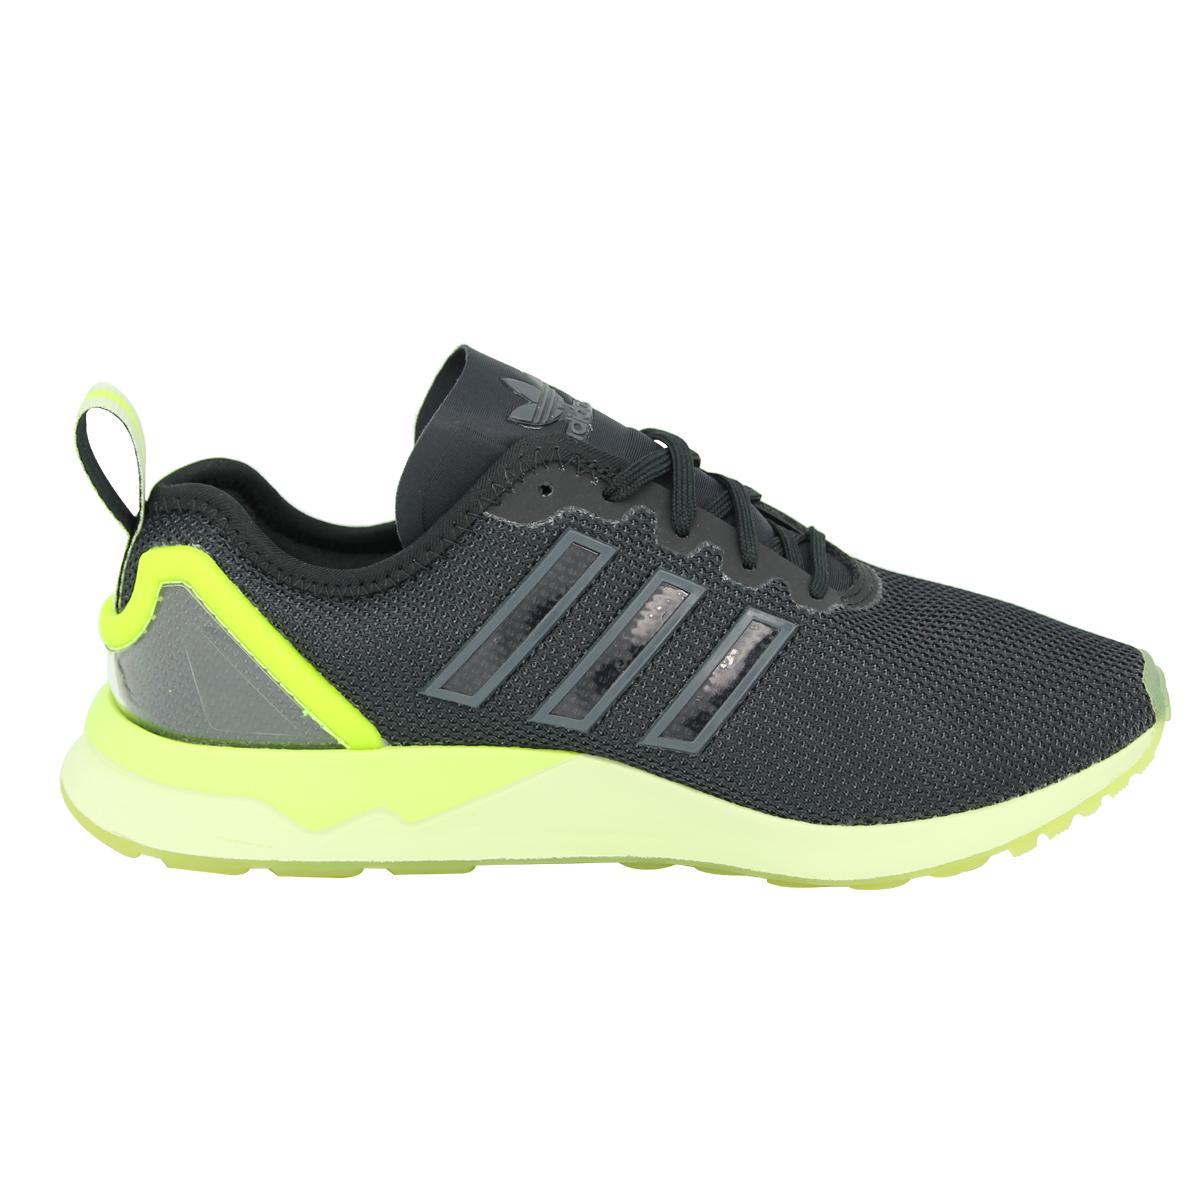 Mode Originals Chaussures Adidas Sneakers Homme Adv Noir Zx Flux wHqnRpv